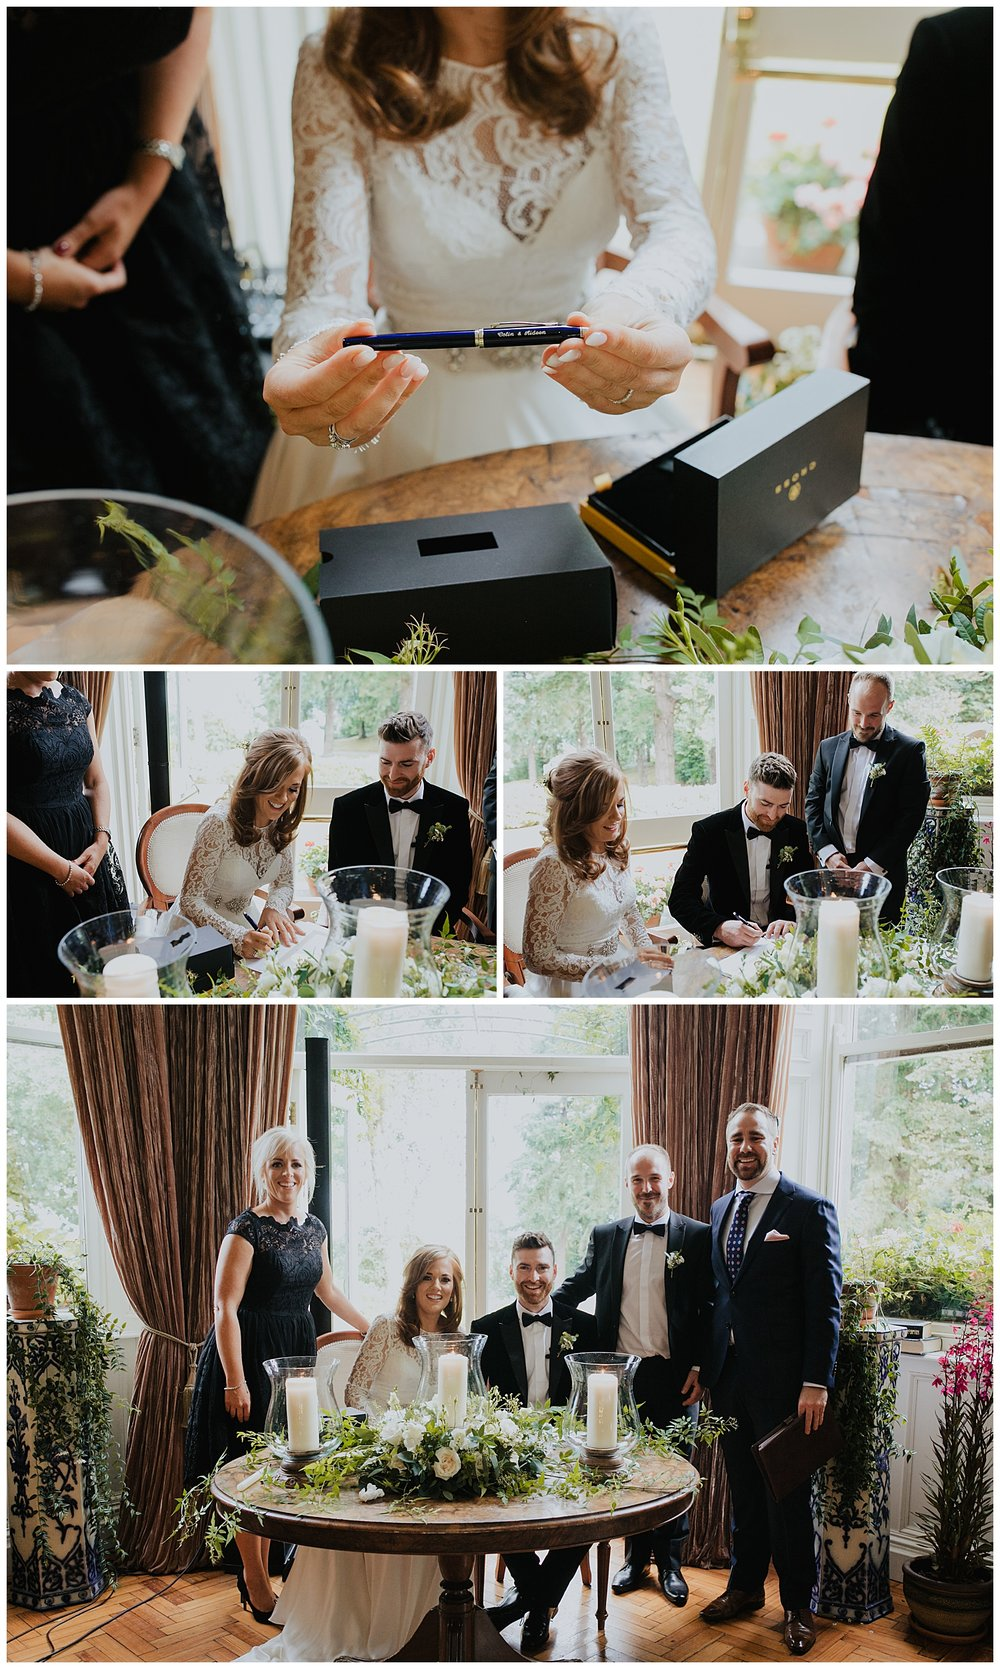 a&c_tinakilly_black_tie_wedding_photographer_livia_figueiredo_110.jpg